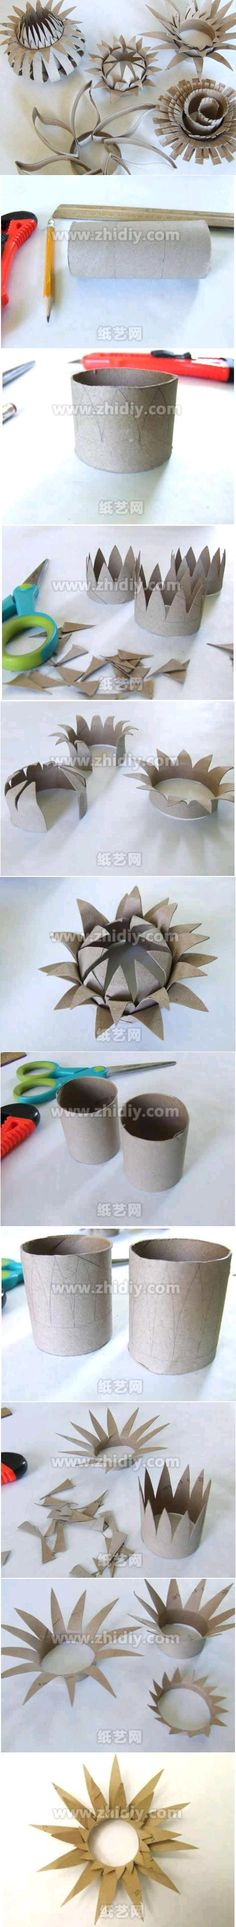 DIY Toilet Roll Flower